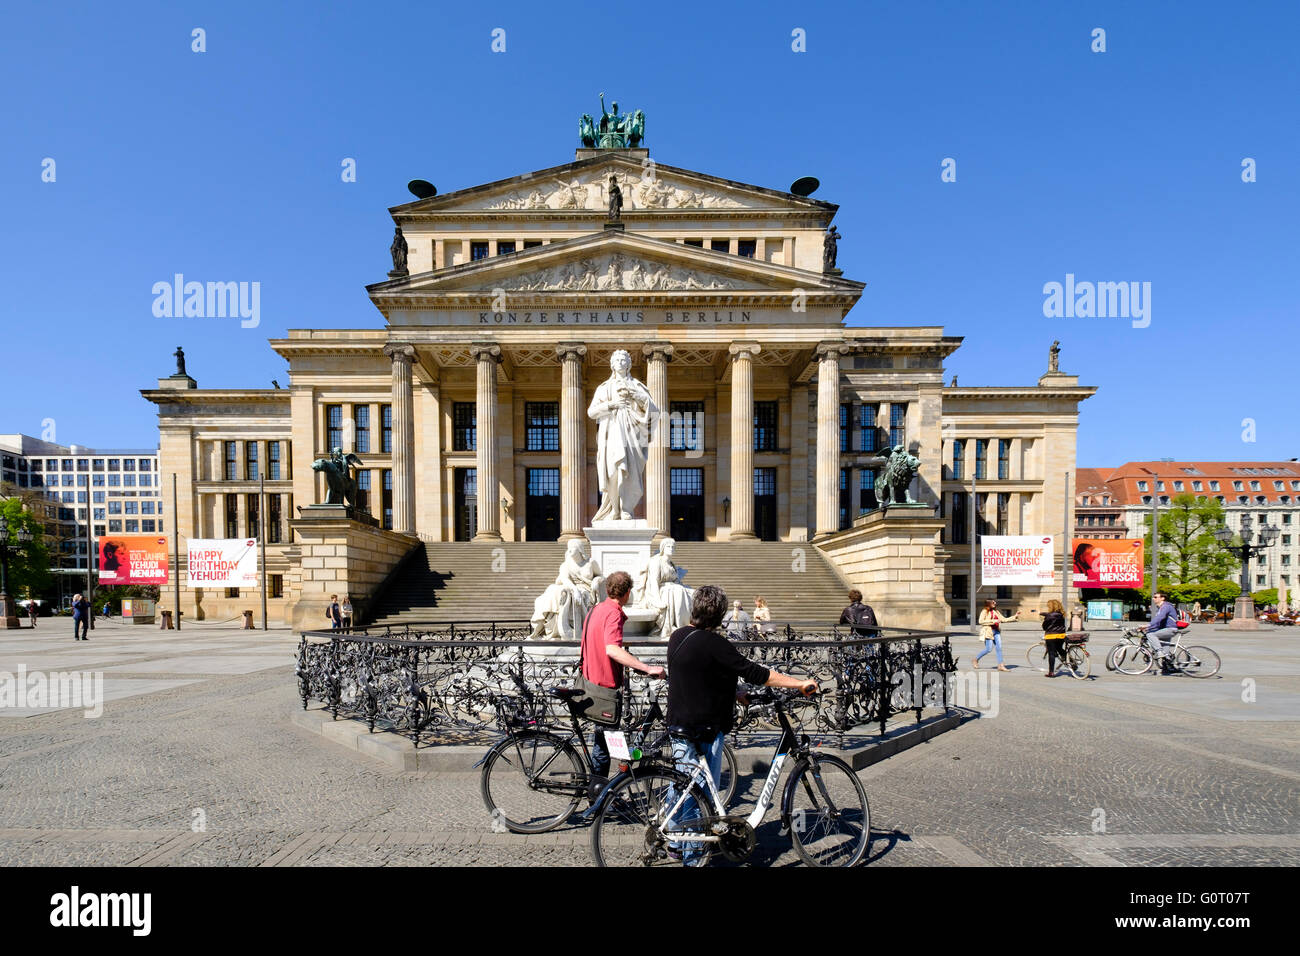 Konzerthaus y Schiller estatua en la plaza Gendarmenmarkt de Berlín Mitte Alemania Imagen De Stock